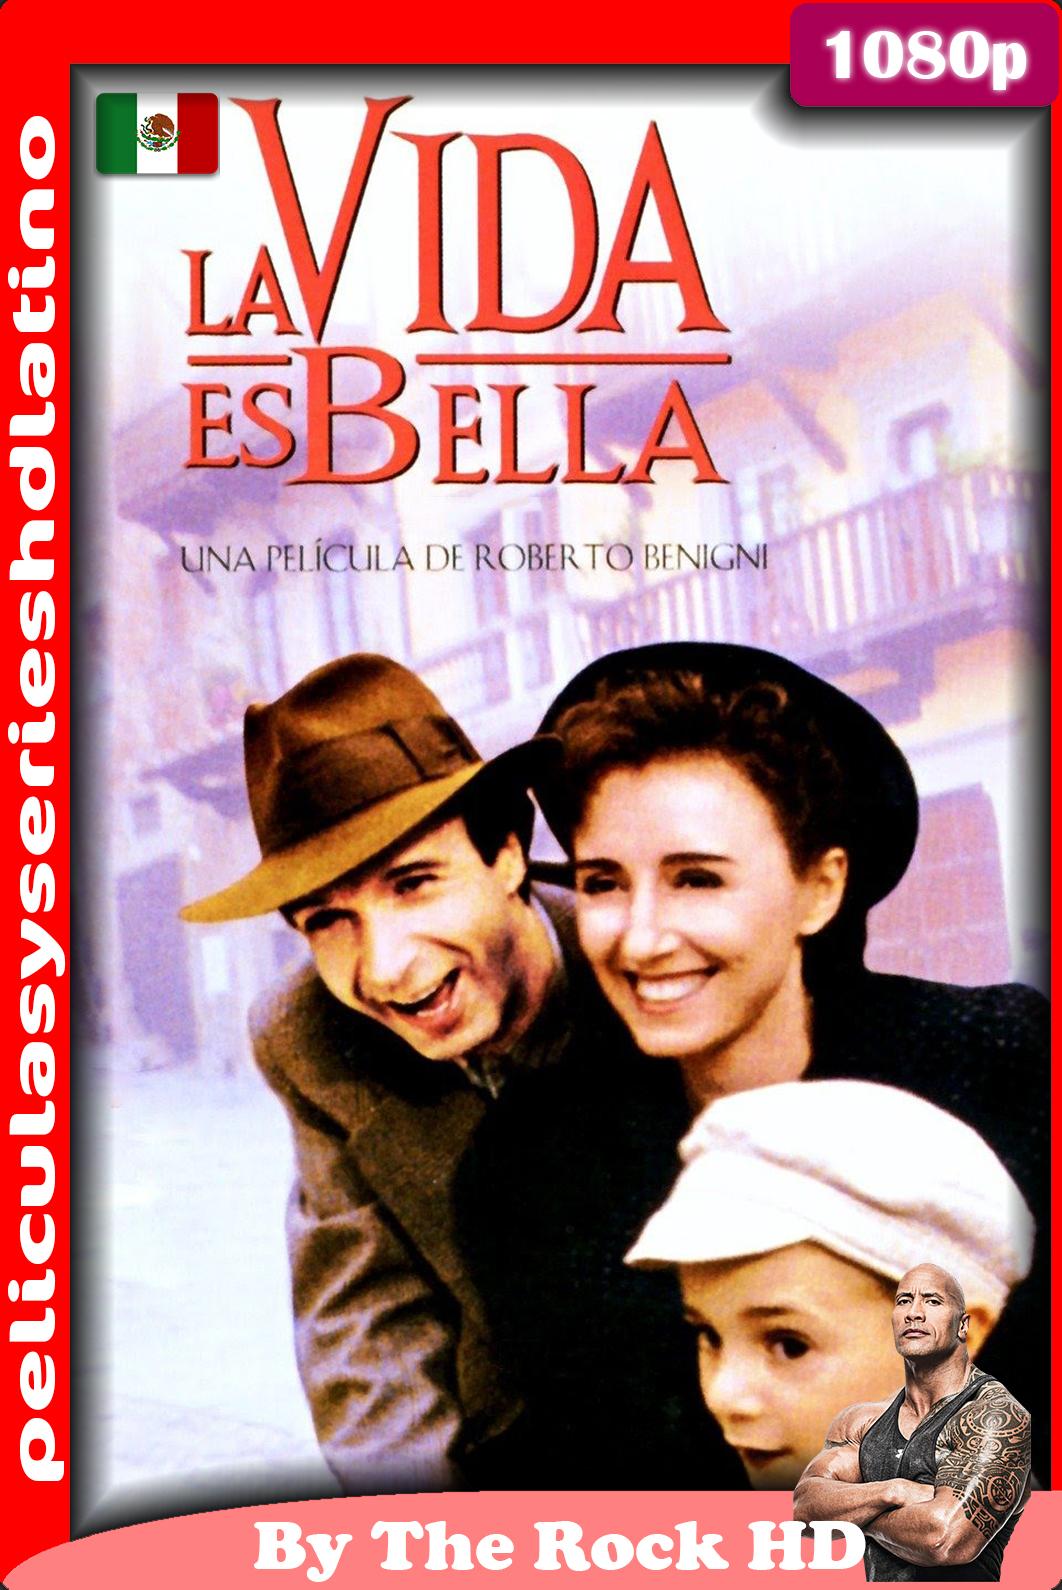 La vida es bella, (1997) [1080p] [Latino] [Google Drive]